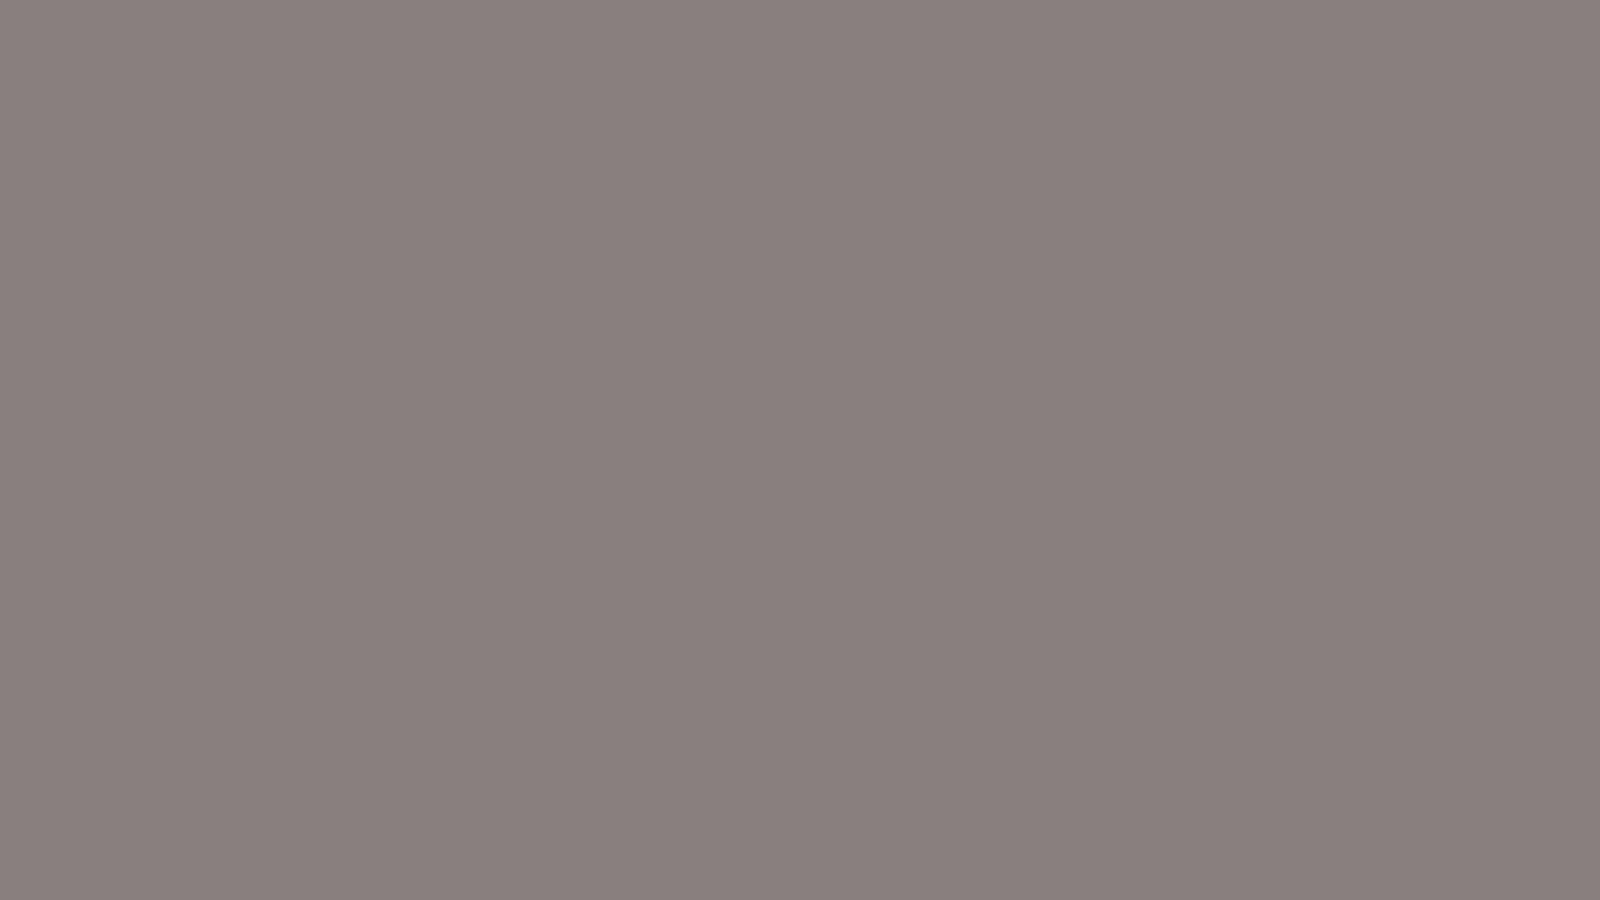 1600x900 Rocket Metallic Solid Color Background